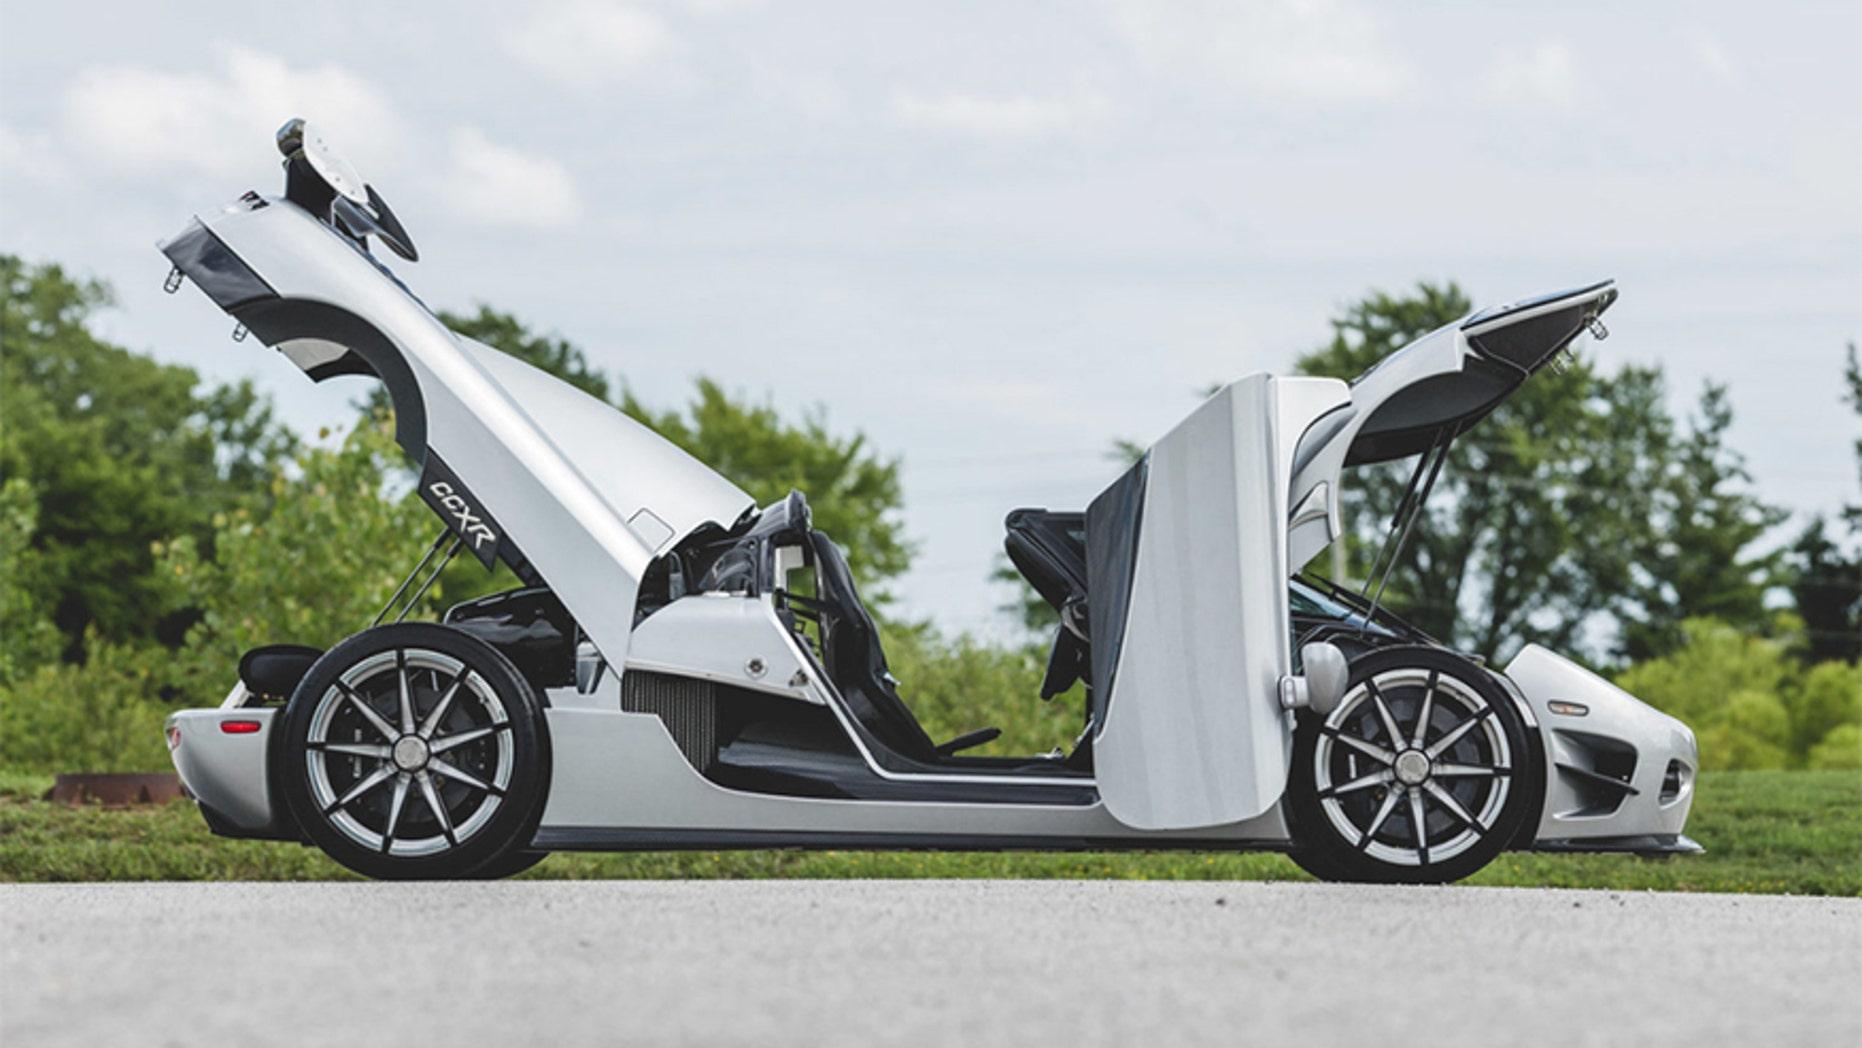 Floyd Mayweather's $4.8M Koenigsegg CCXR Trevita heads to auction ...